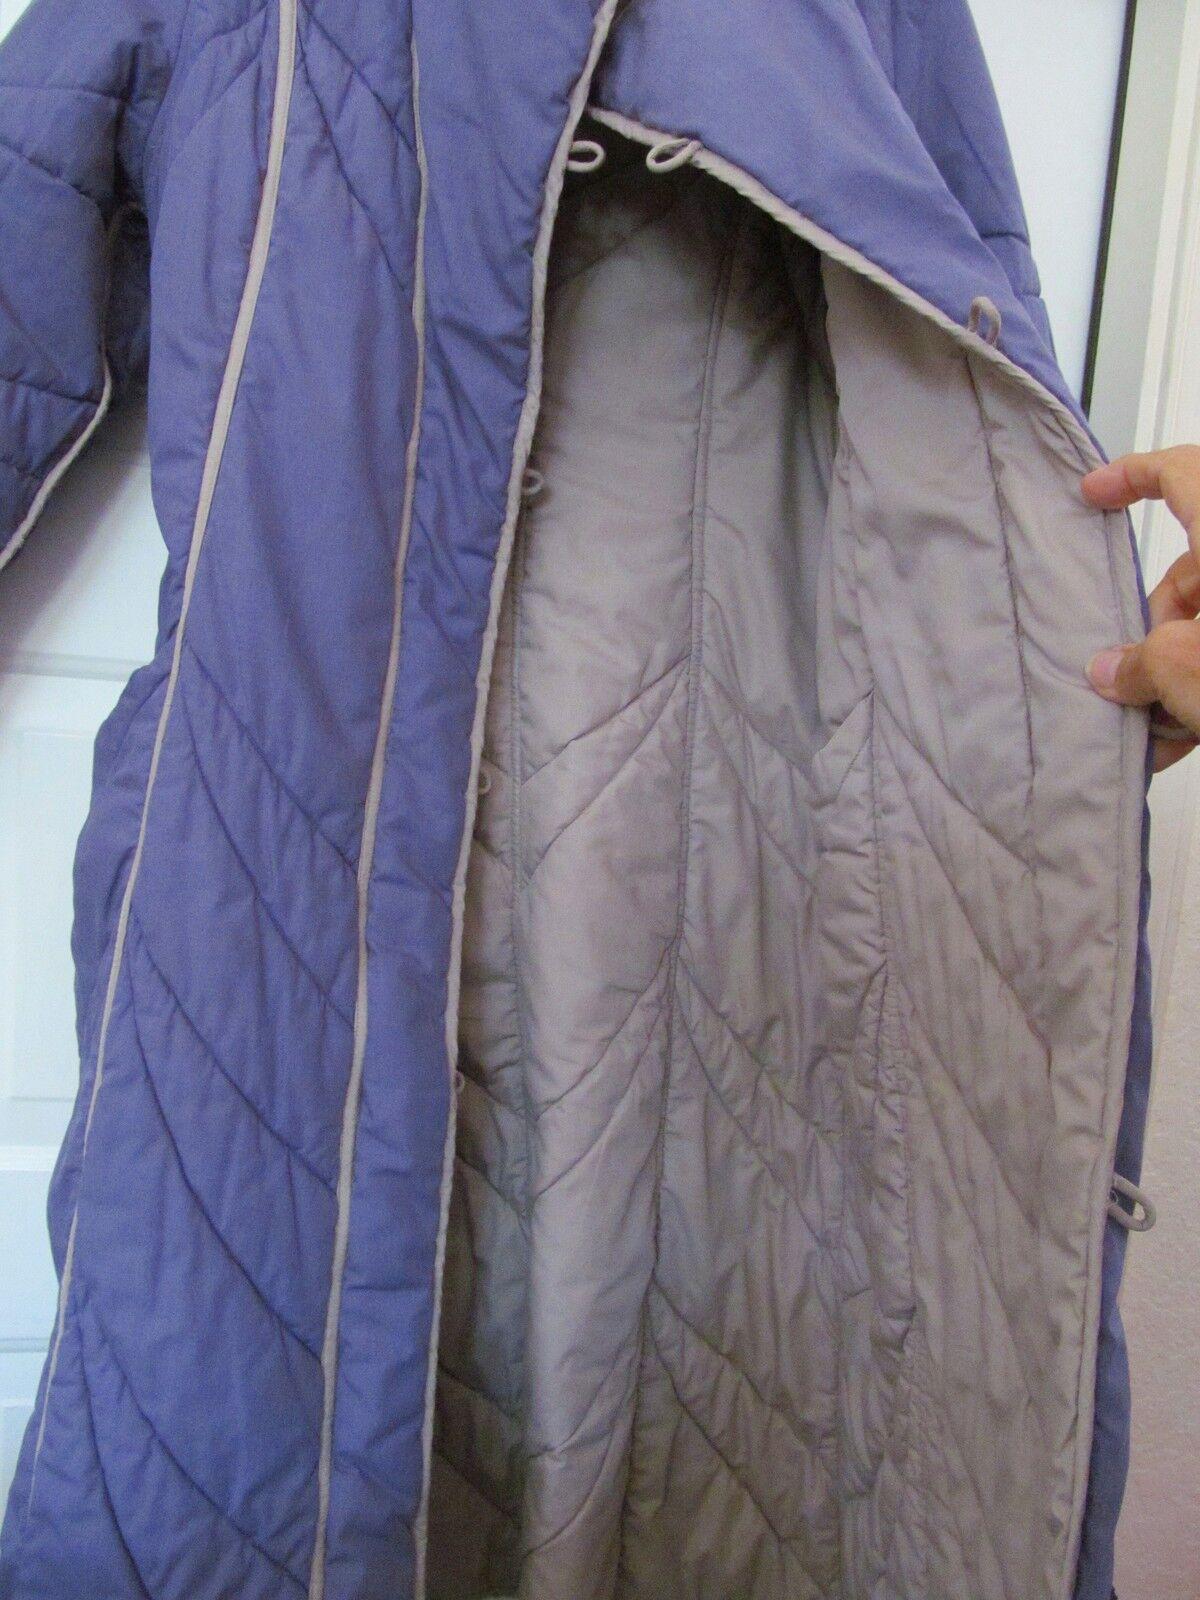 PORTRAIT Quilted Coat Reversible Lavender Beige Women's NO SIZE TAG TAG TAG S M 26748d